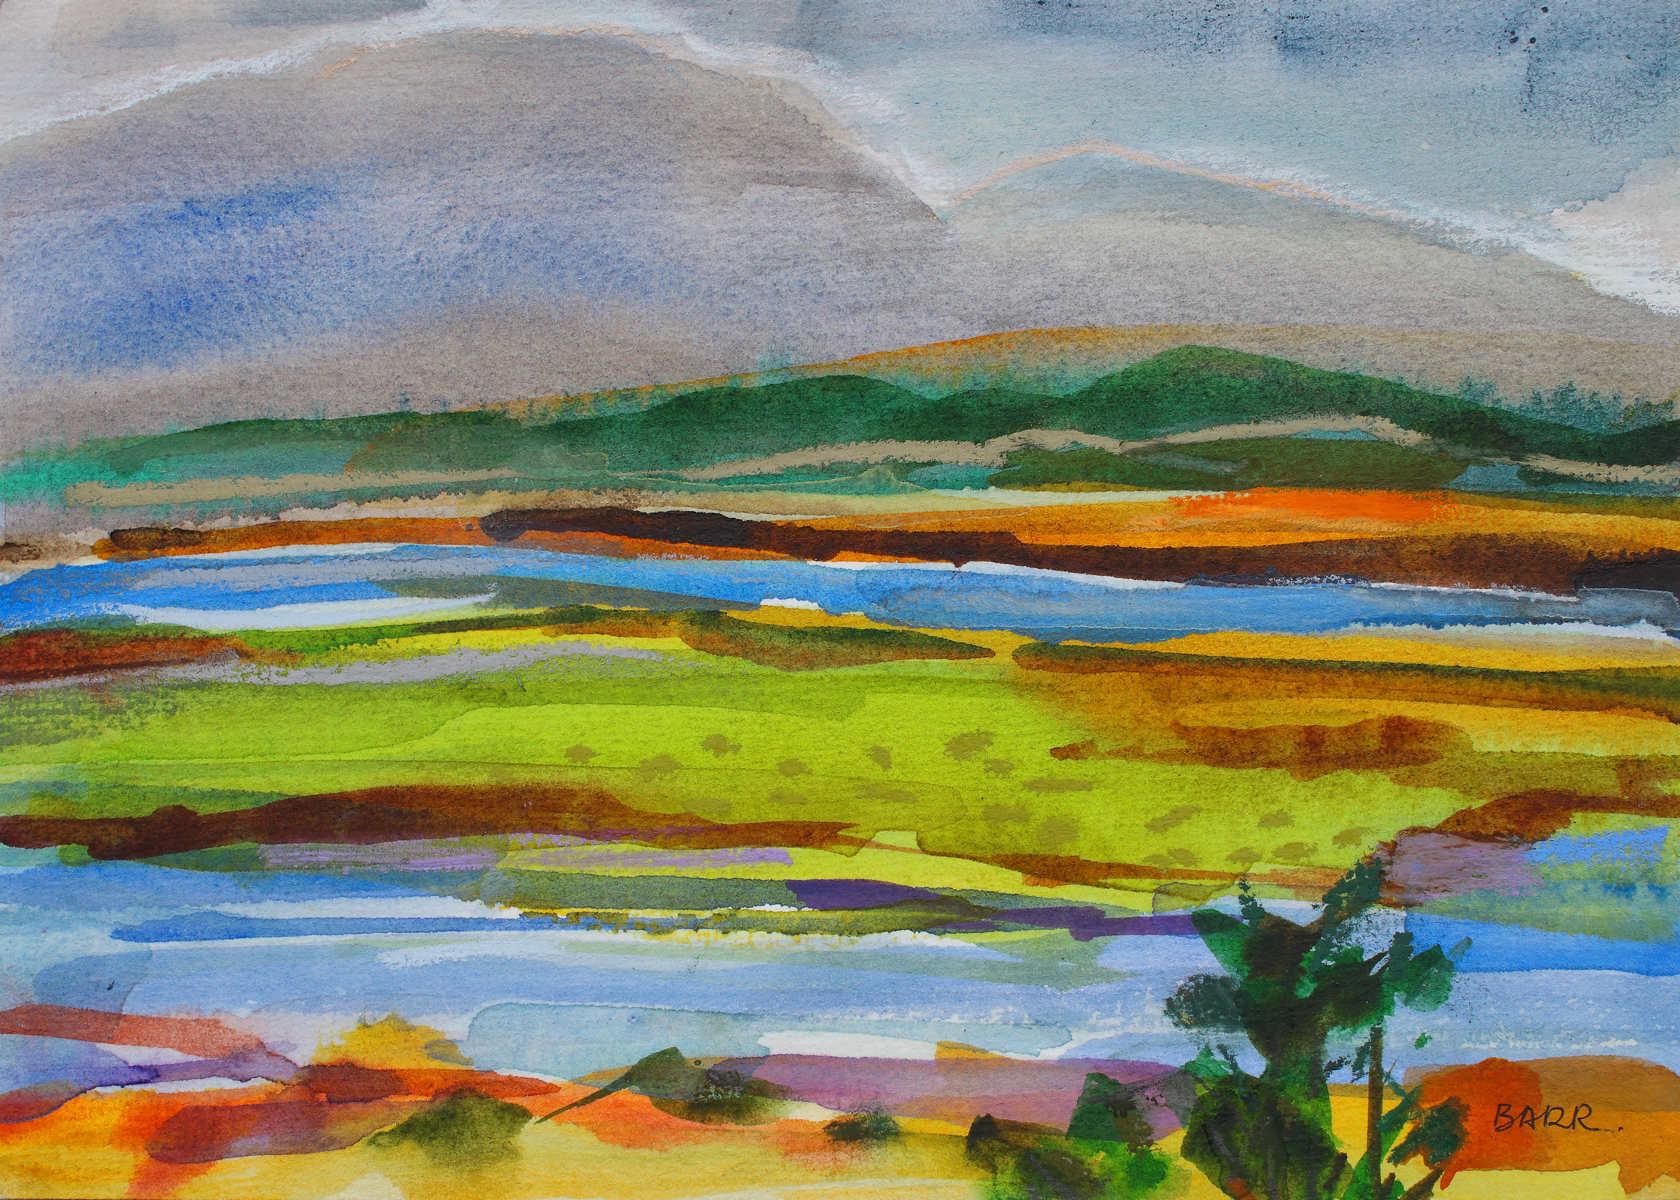 Watercolour landscape titled Wetland by Shona Barr